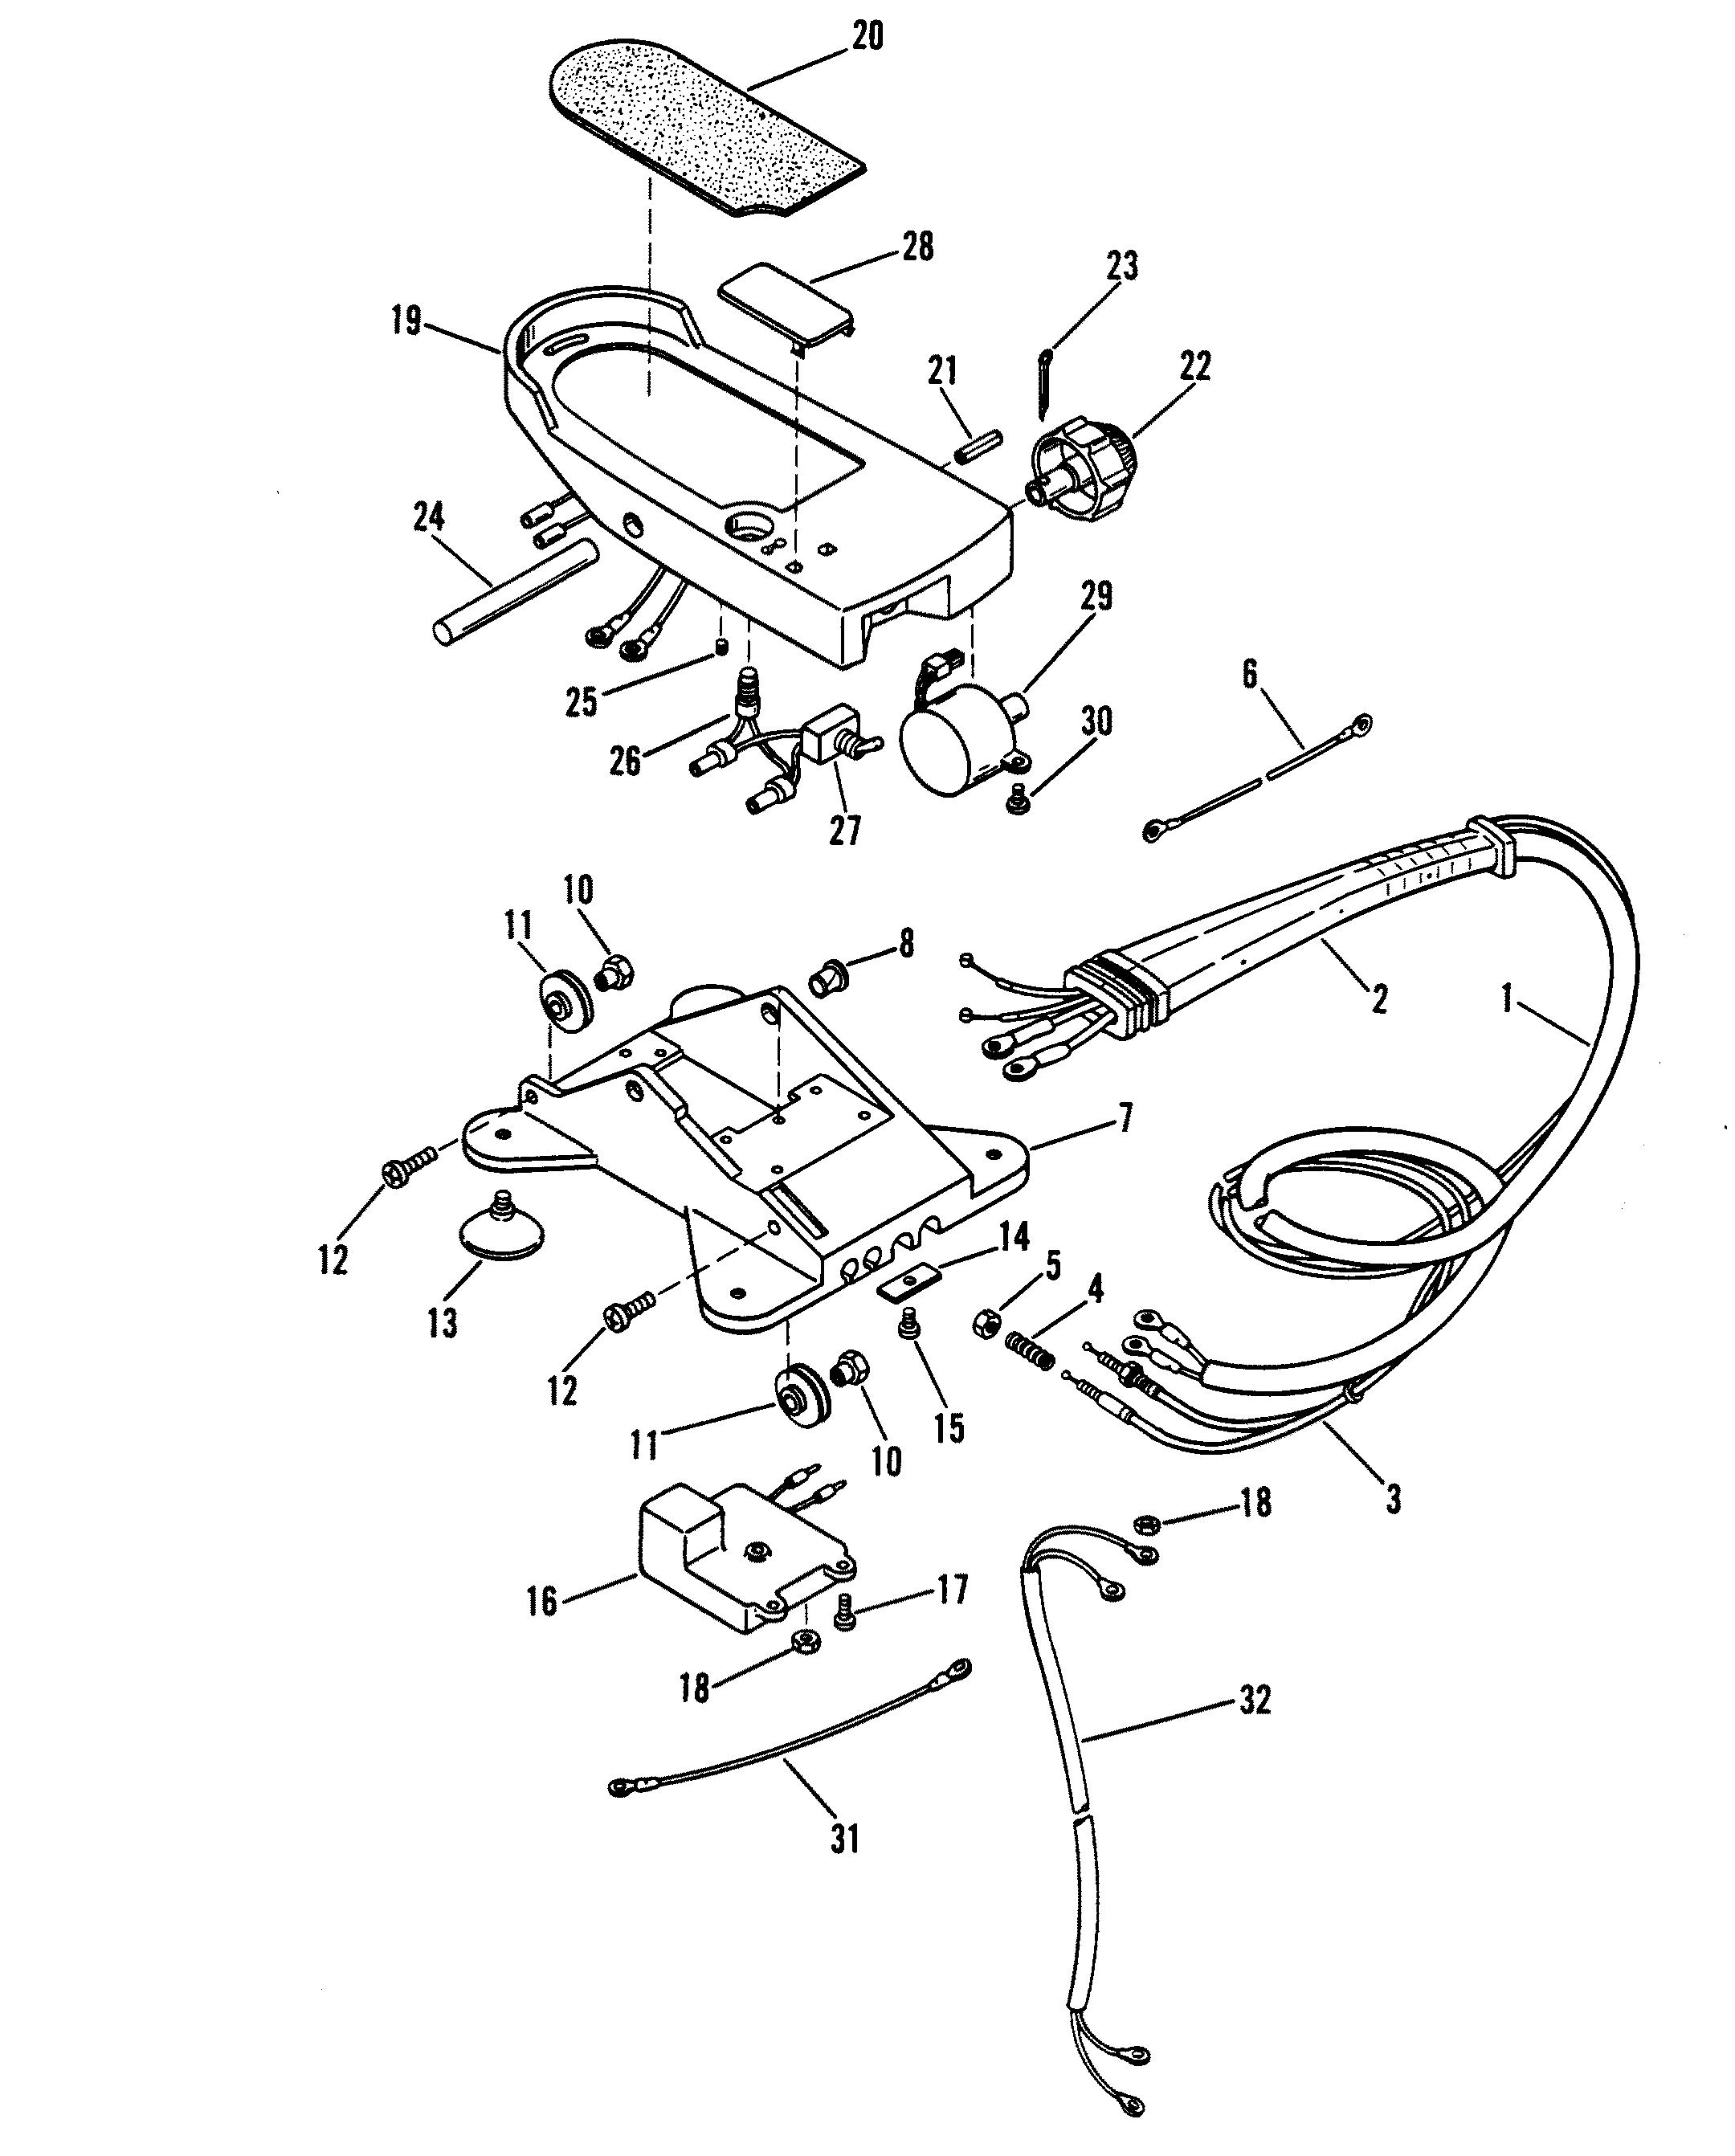 motorguide wiring harness